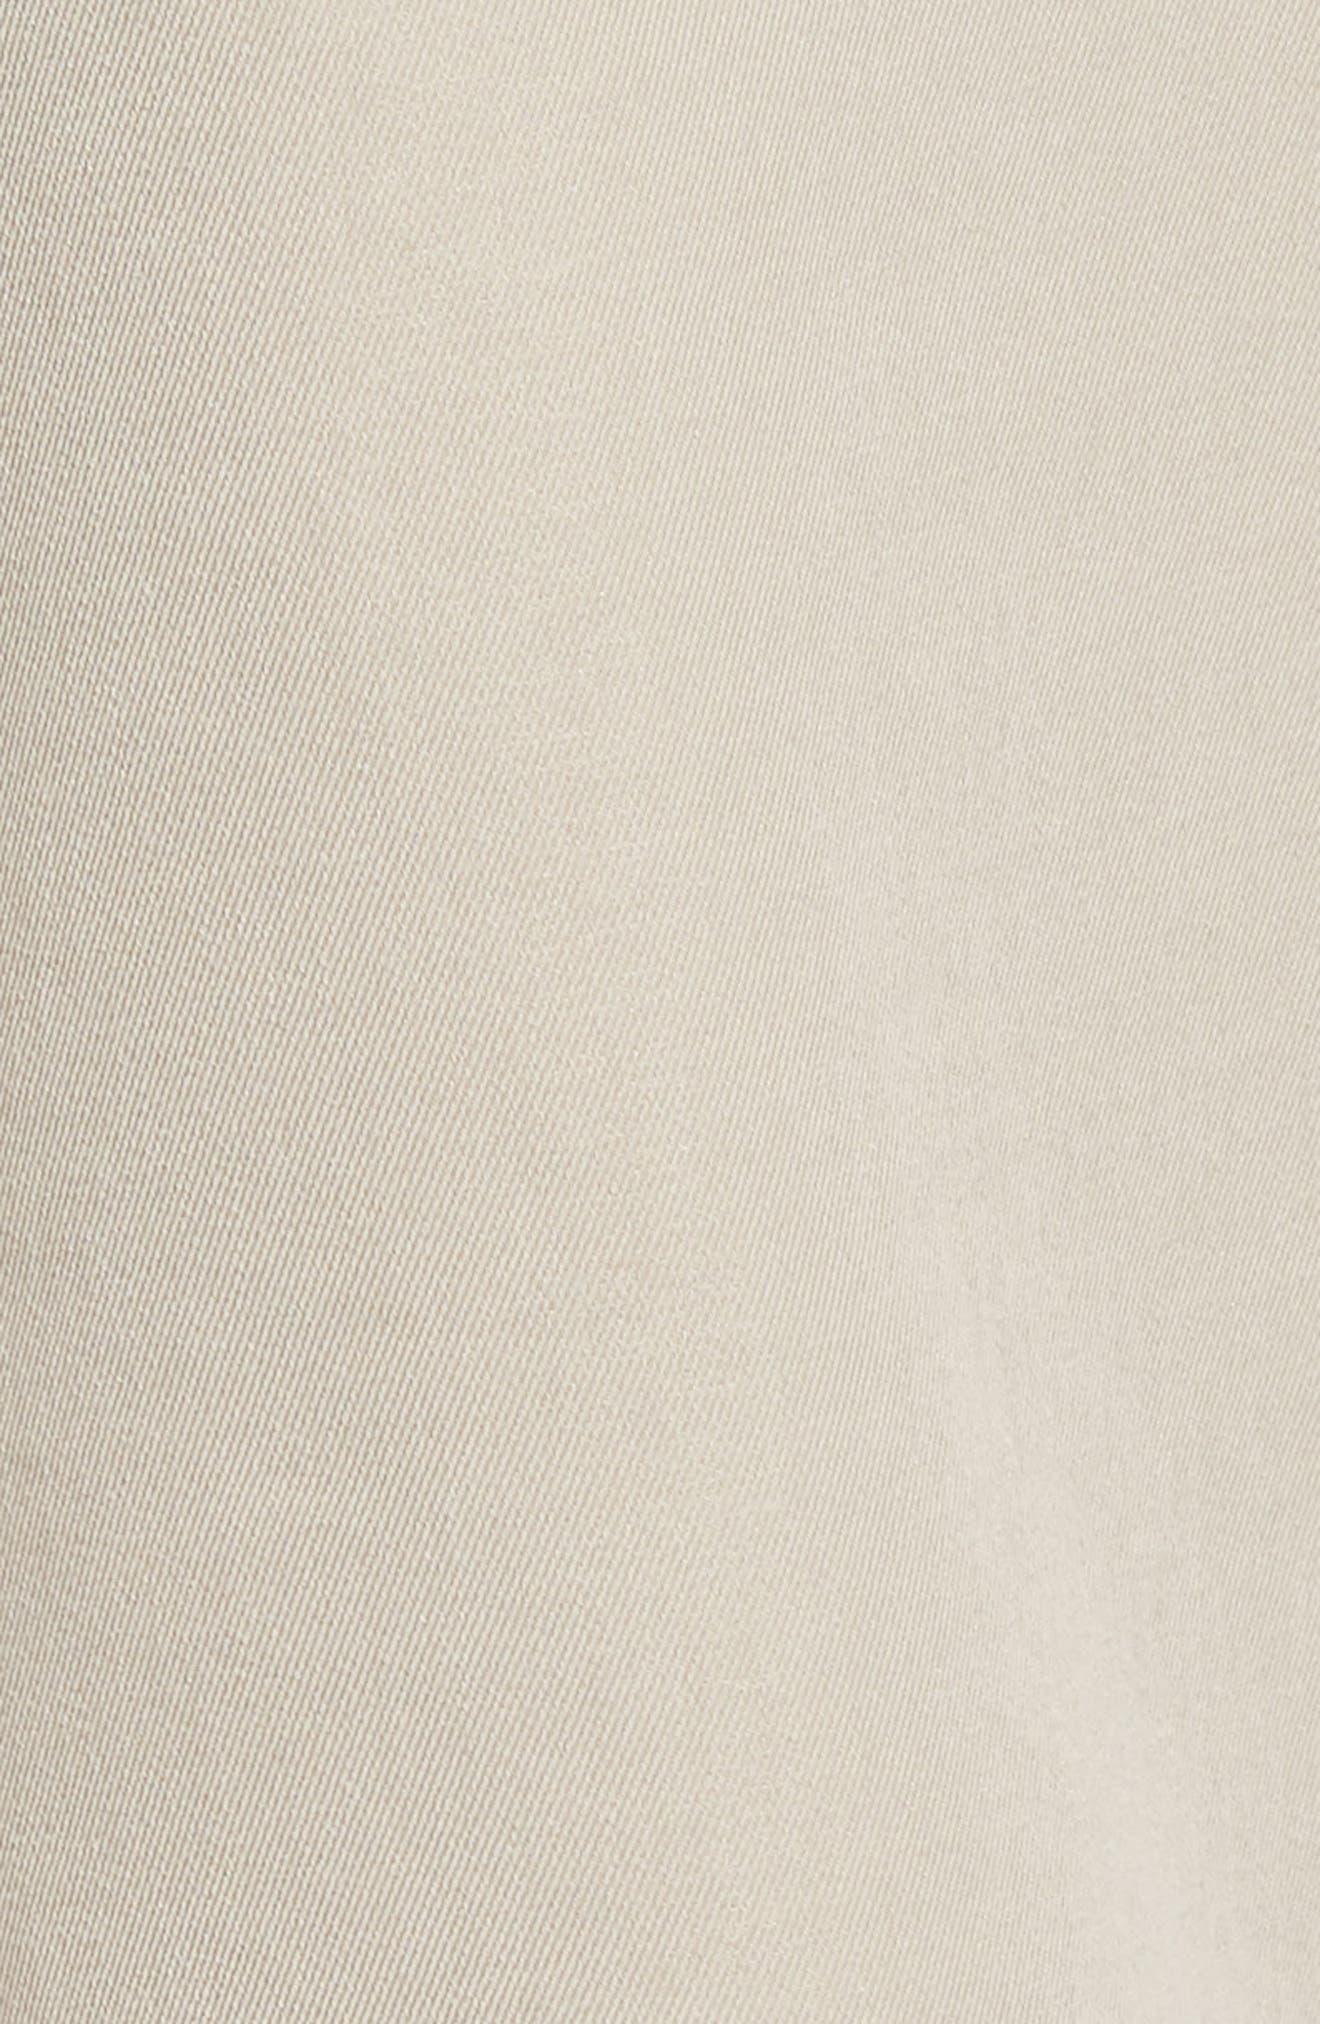 eb66 Regular Fit Performance Pants,                             Alternate thumbnail 5, color,                             BEIGE